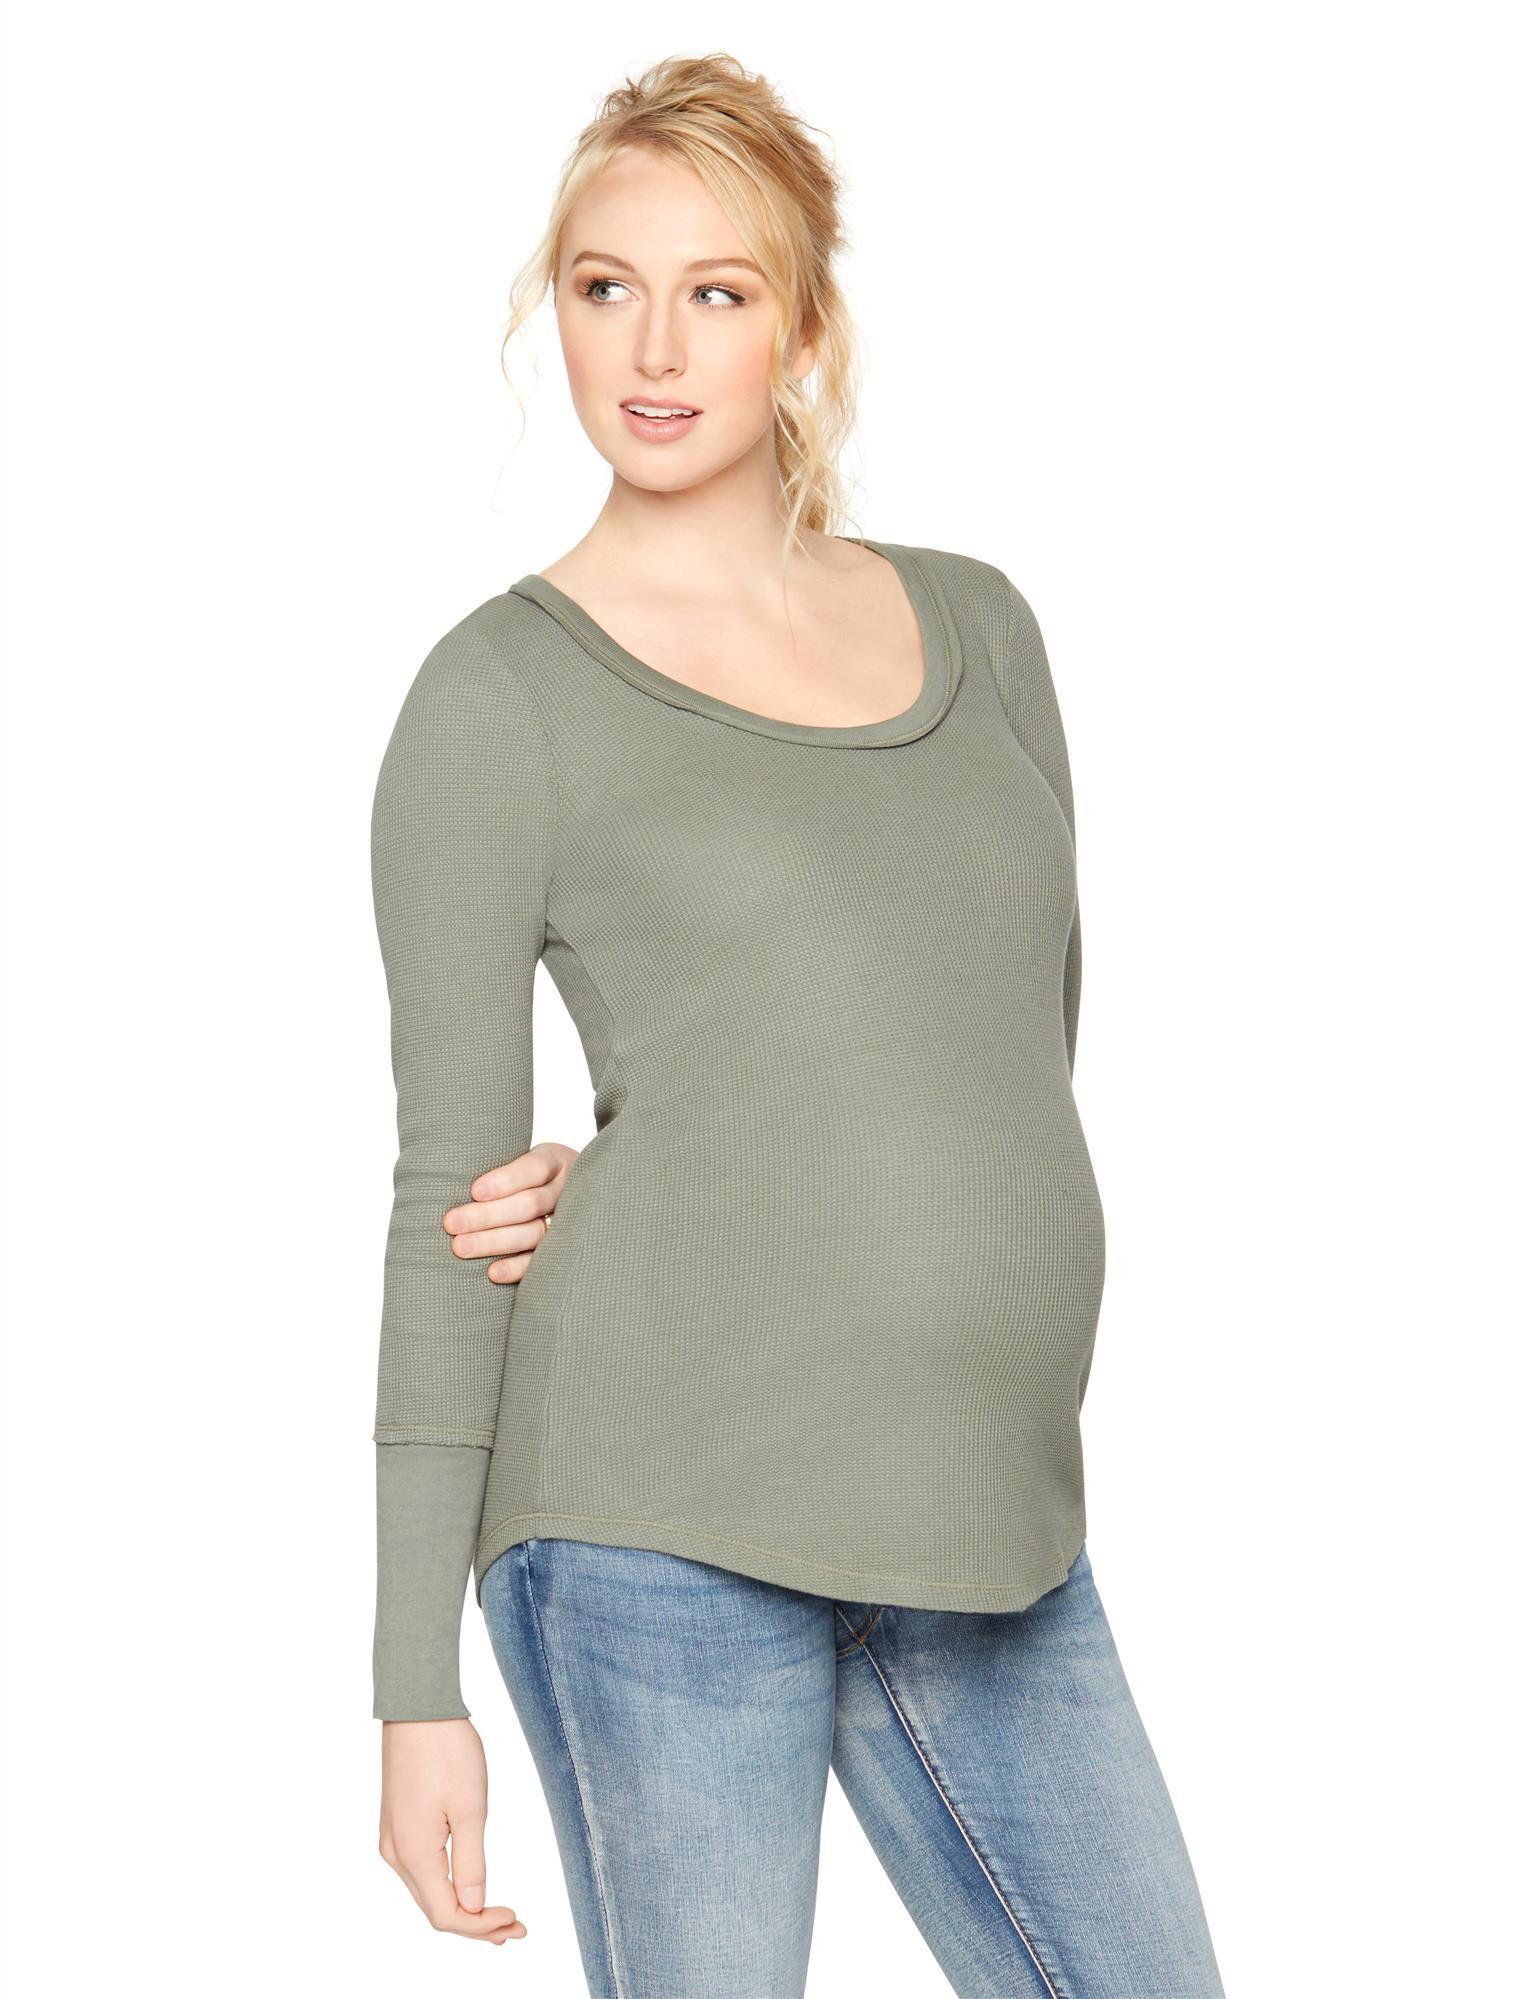 Splendid Maternity Top